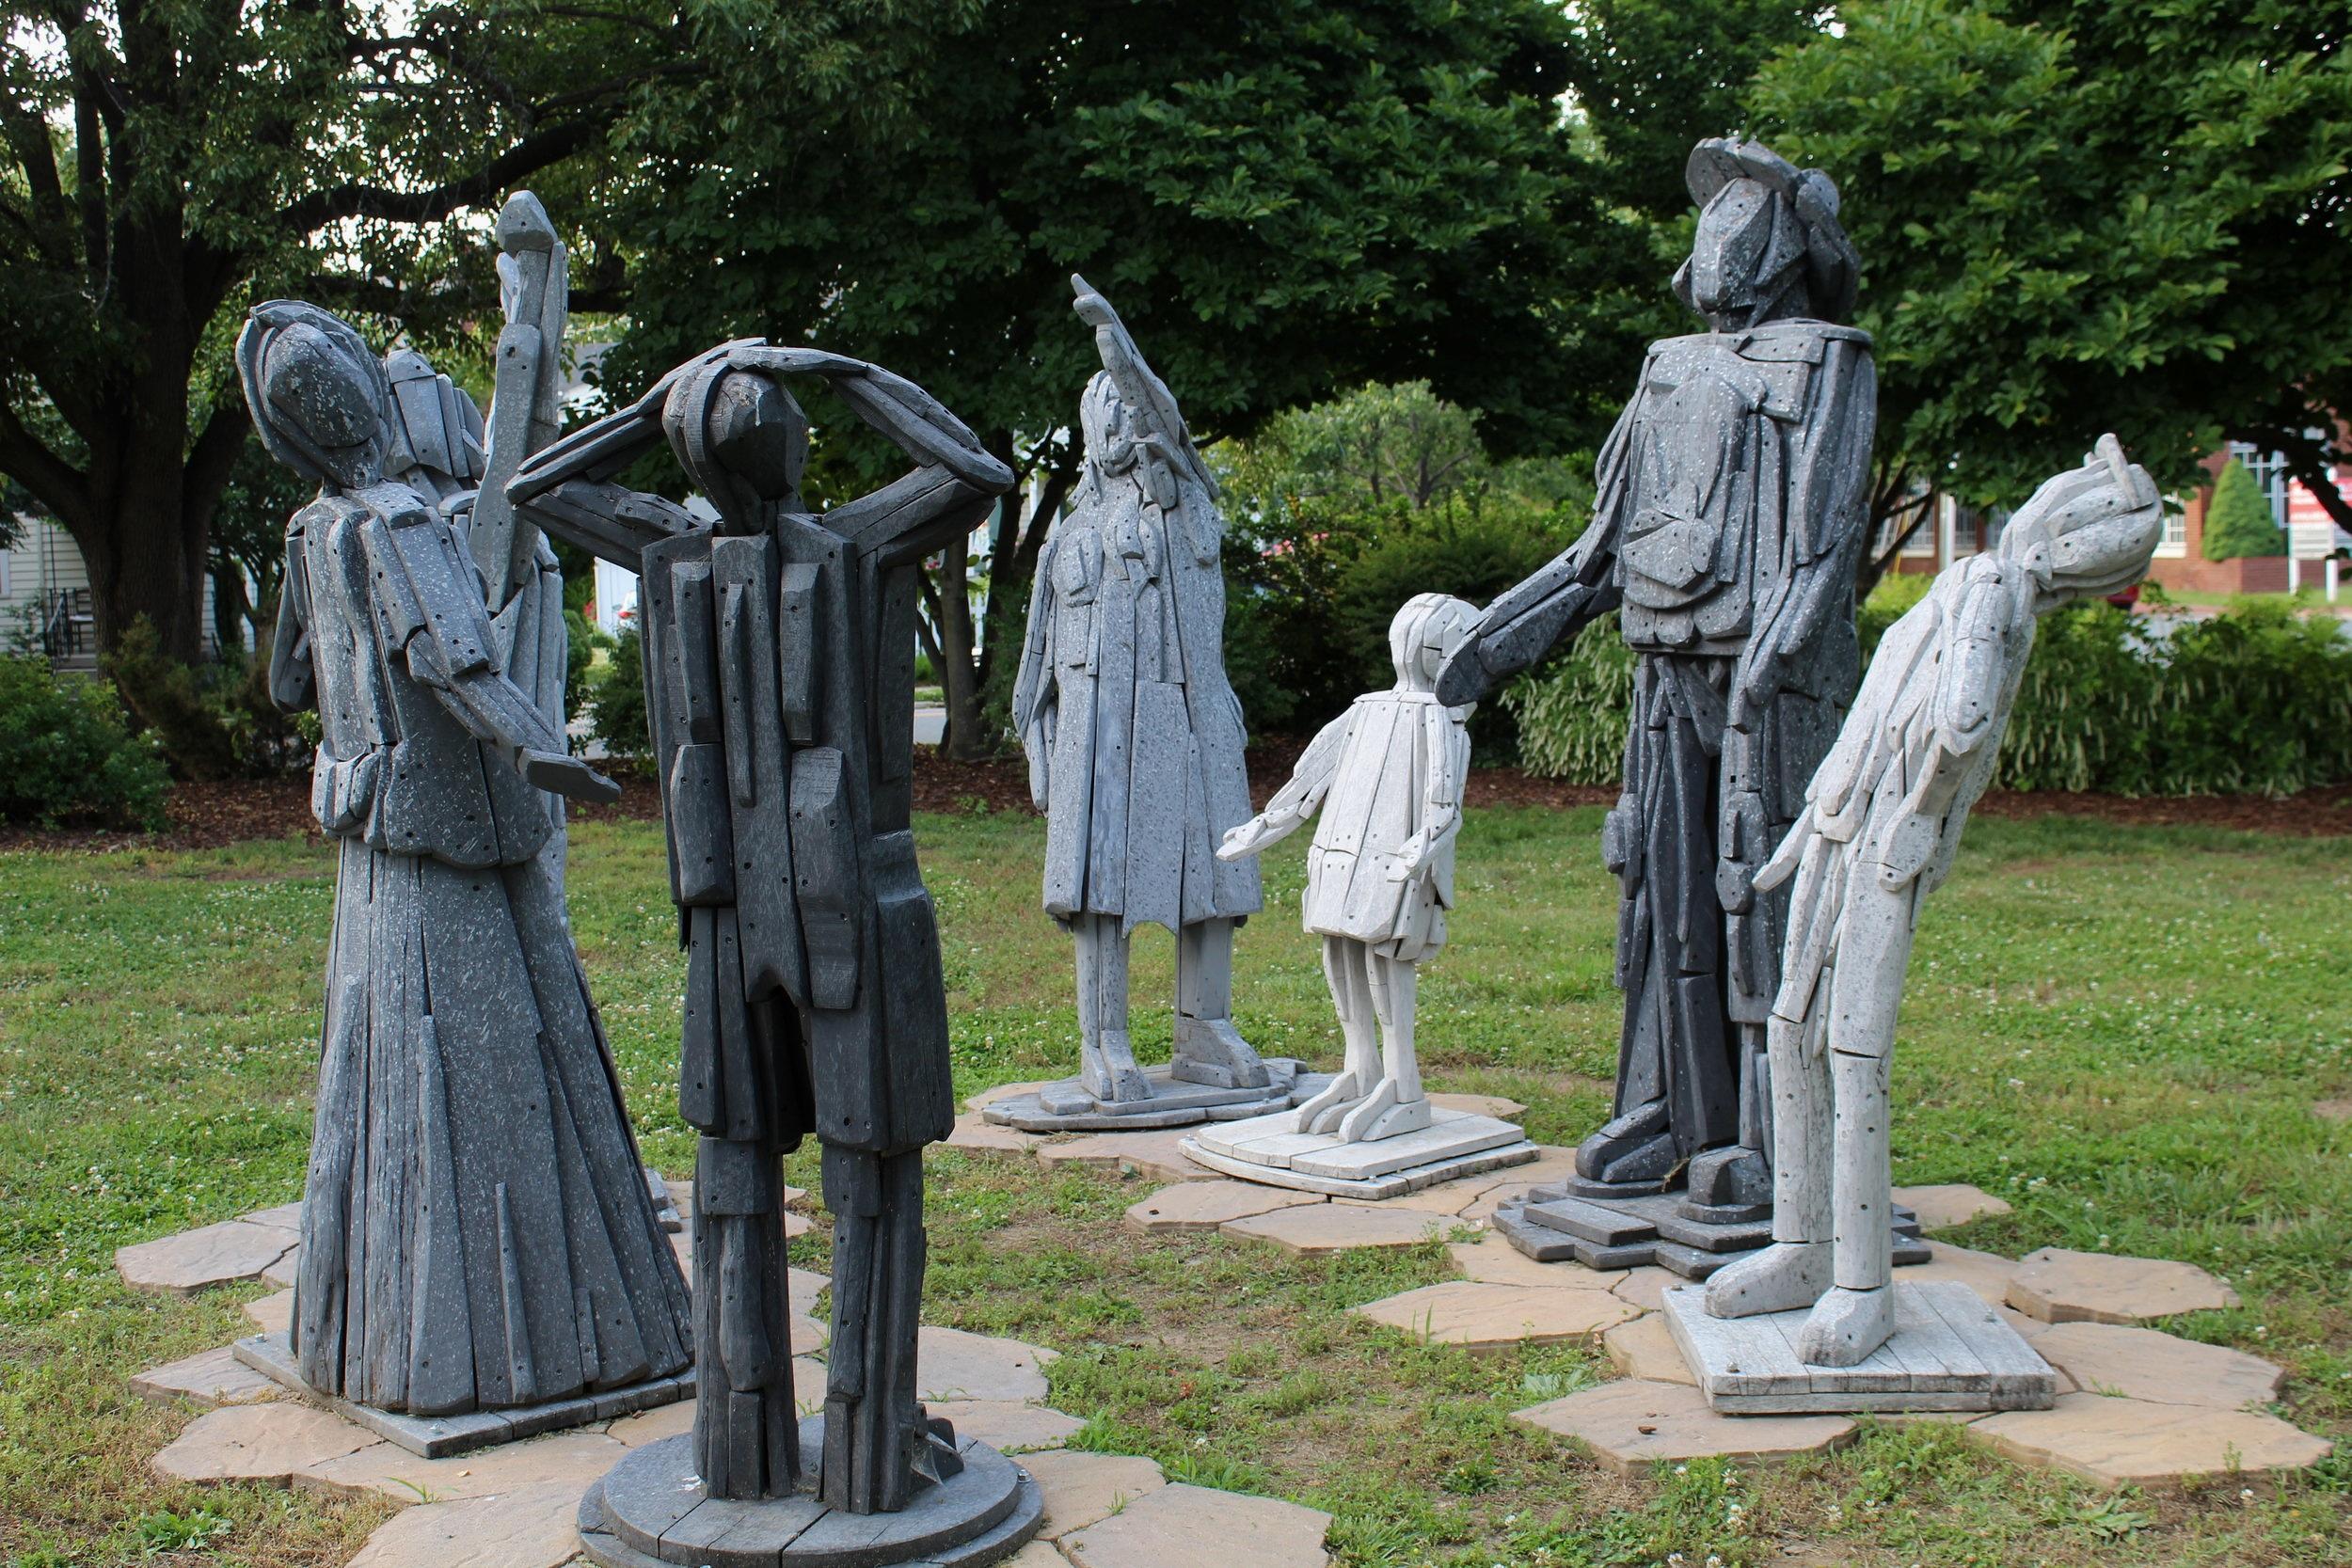 Statues created by FredArts.com